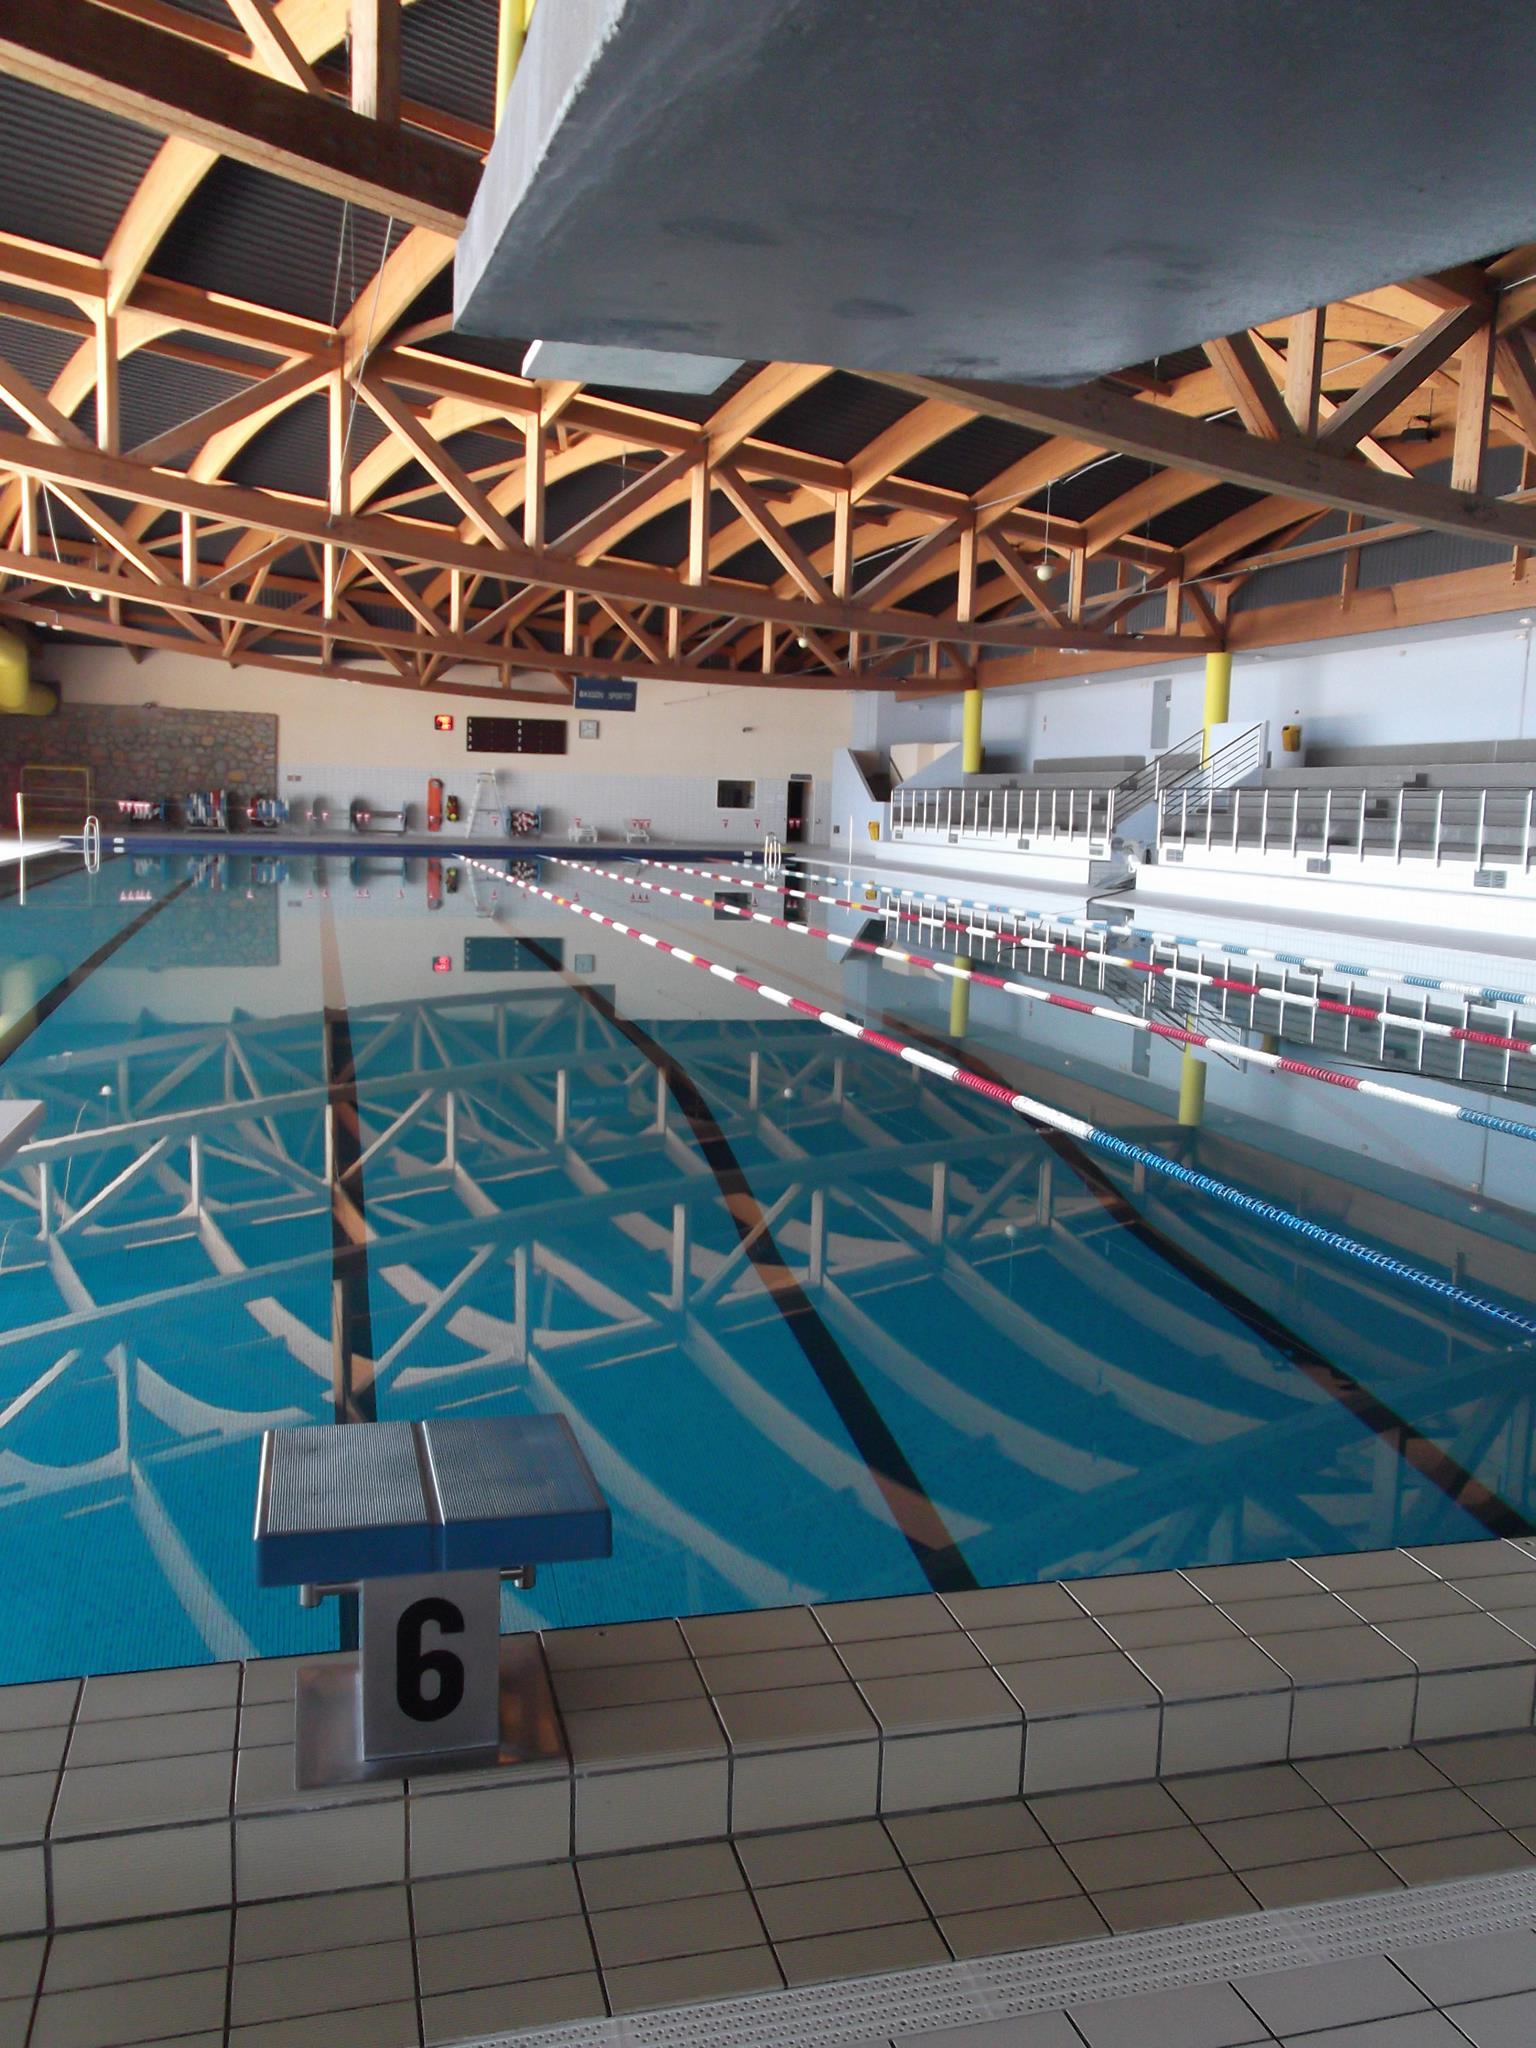 Espace Aquatique Moulin A Vent | Perpignan | Swimming-Pool pour Piscine Moulin A Vent